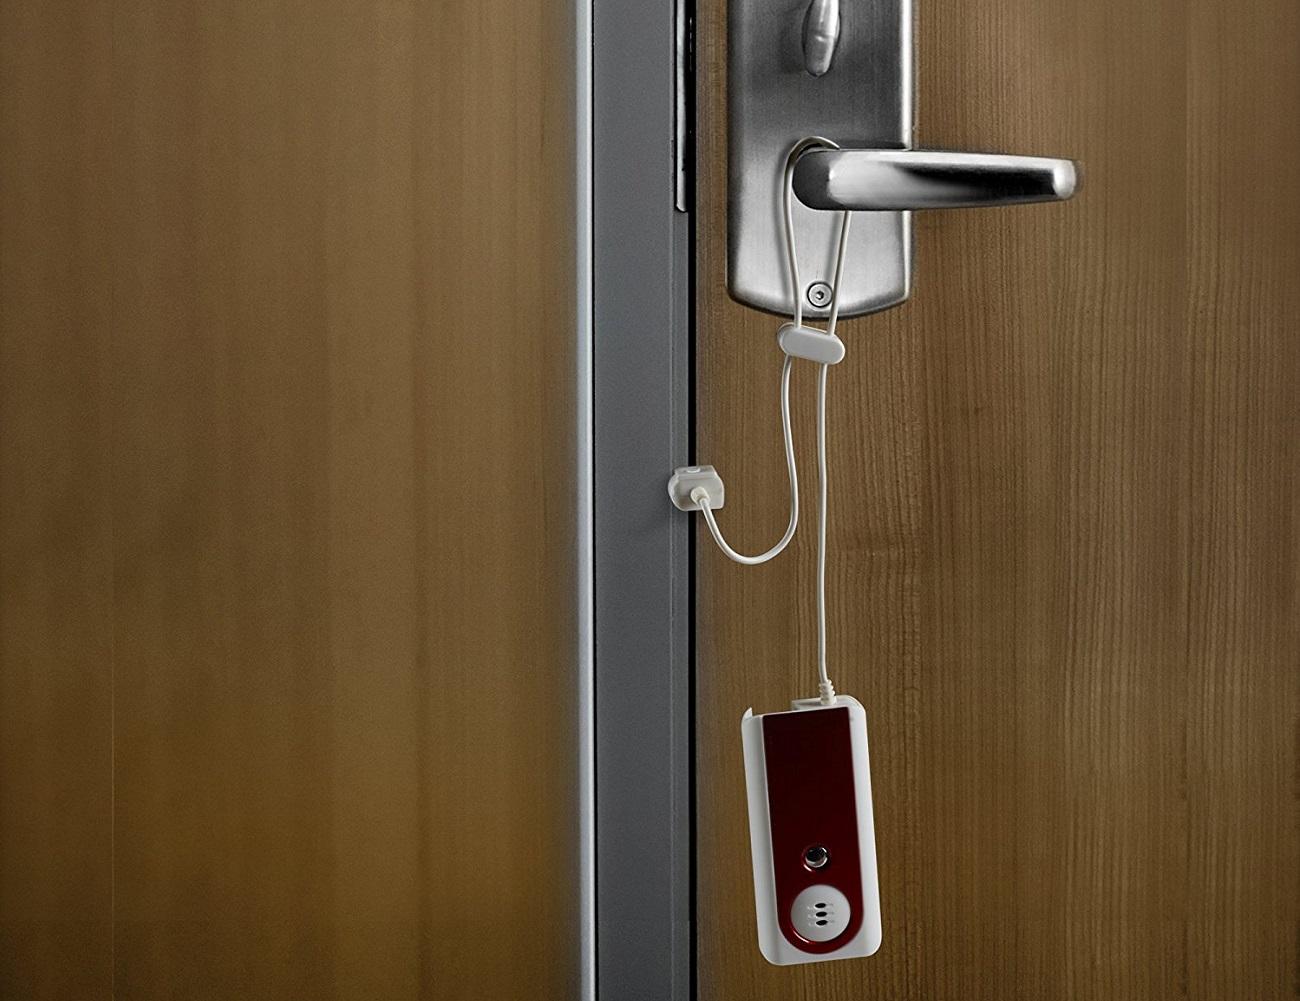 Motion Sensitive Portable Door Alarm ... & Motion Sensitive Portable Door Alarm » Gadget Flow pezcame.com